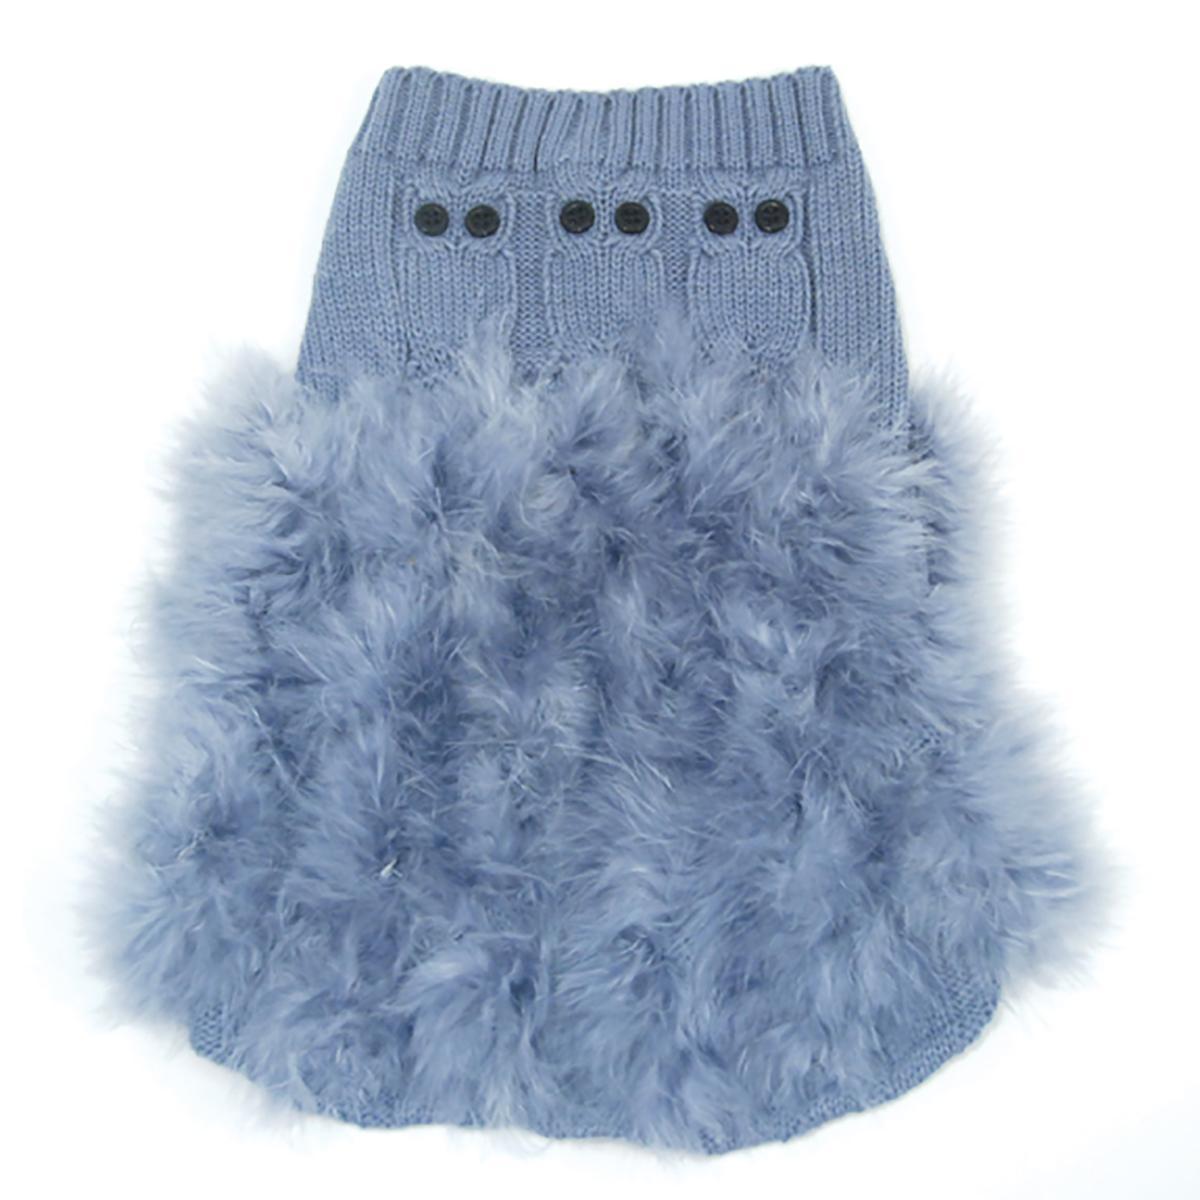 Whoo Me Dog Sweater Dress by Oscar Newman - Steel Blue